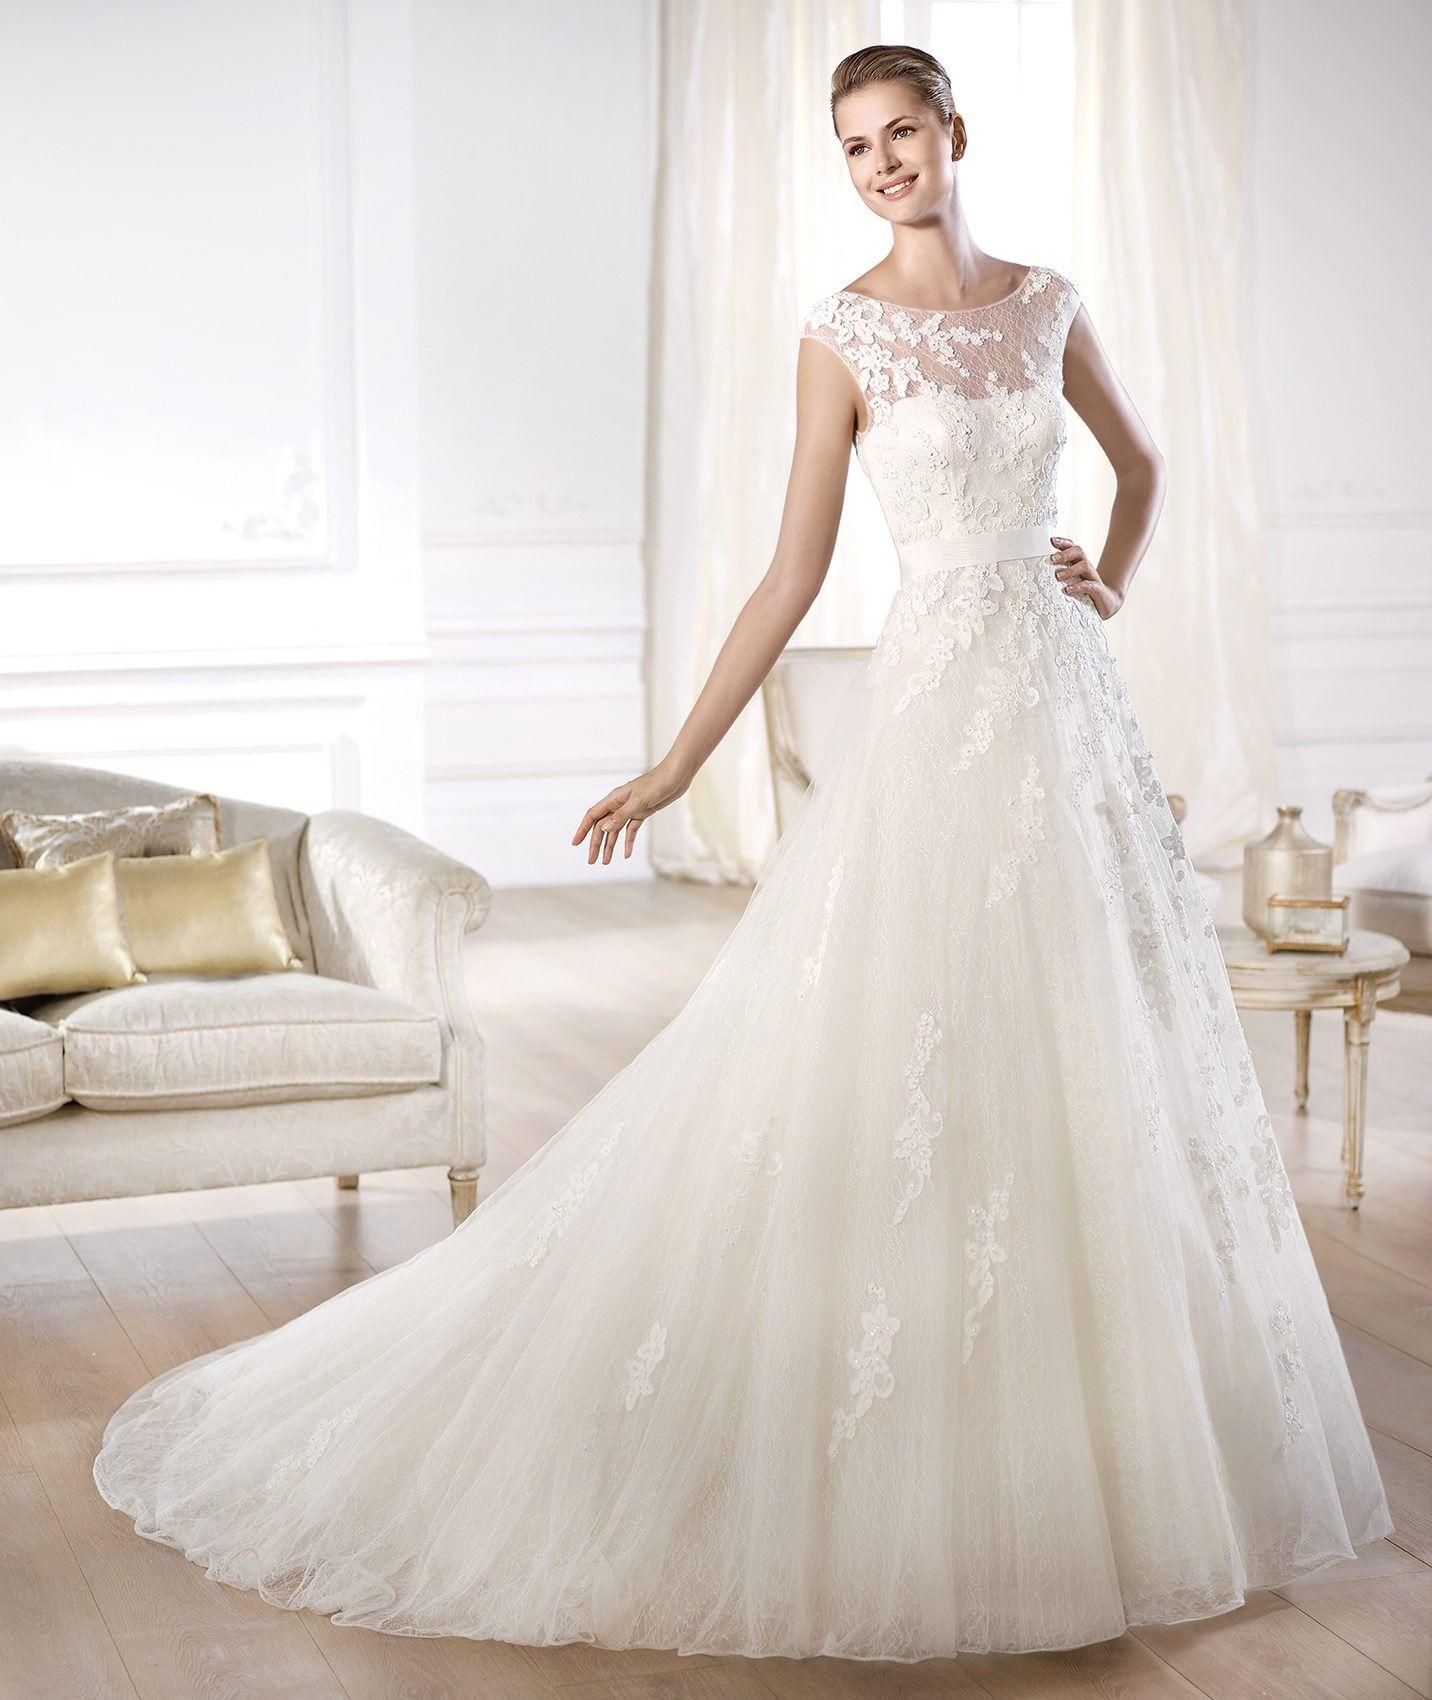 Strapless modern country wedding dress modern wedding dress strapless modern country wedding dress ombrellifo Gallery